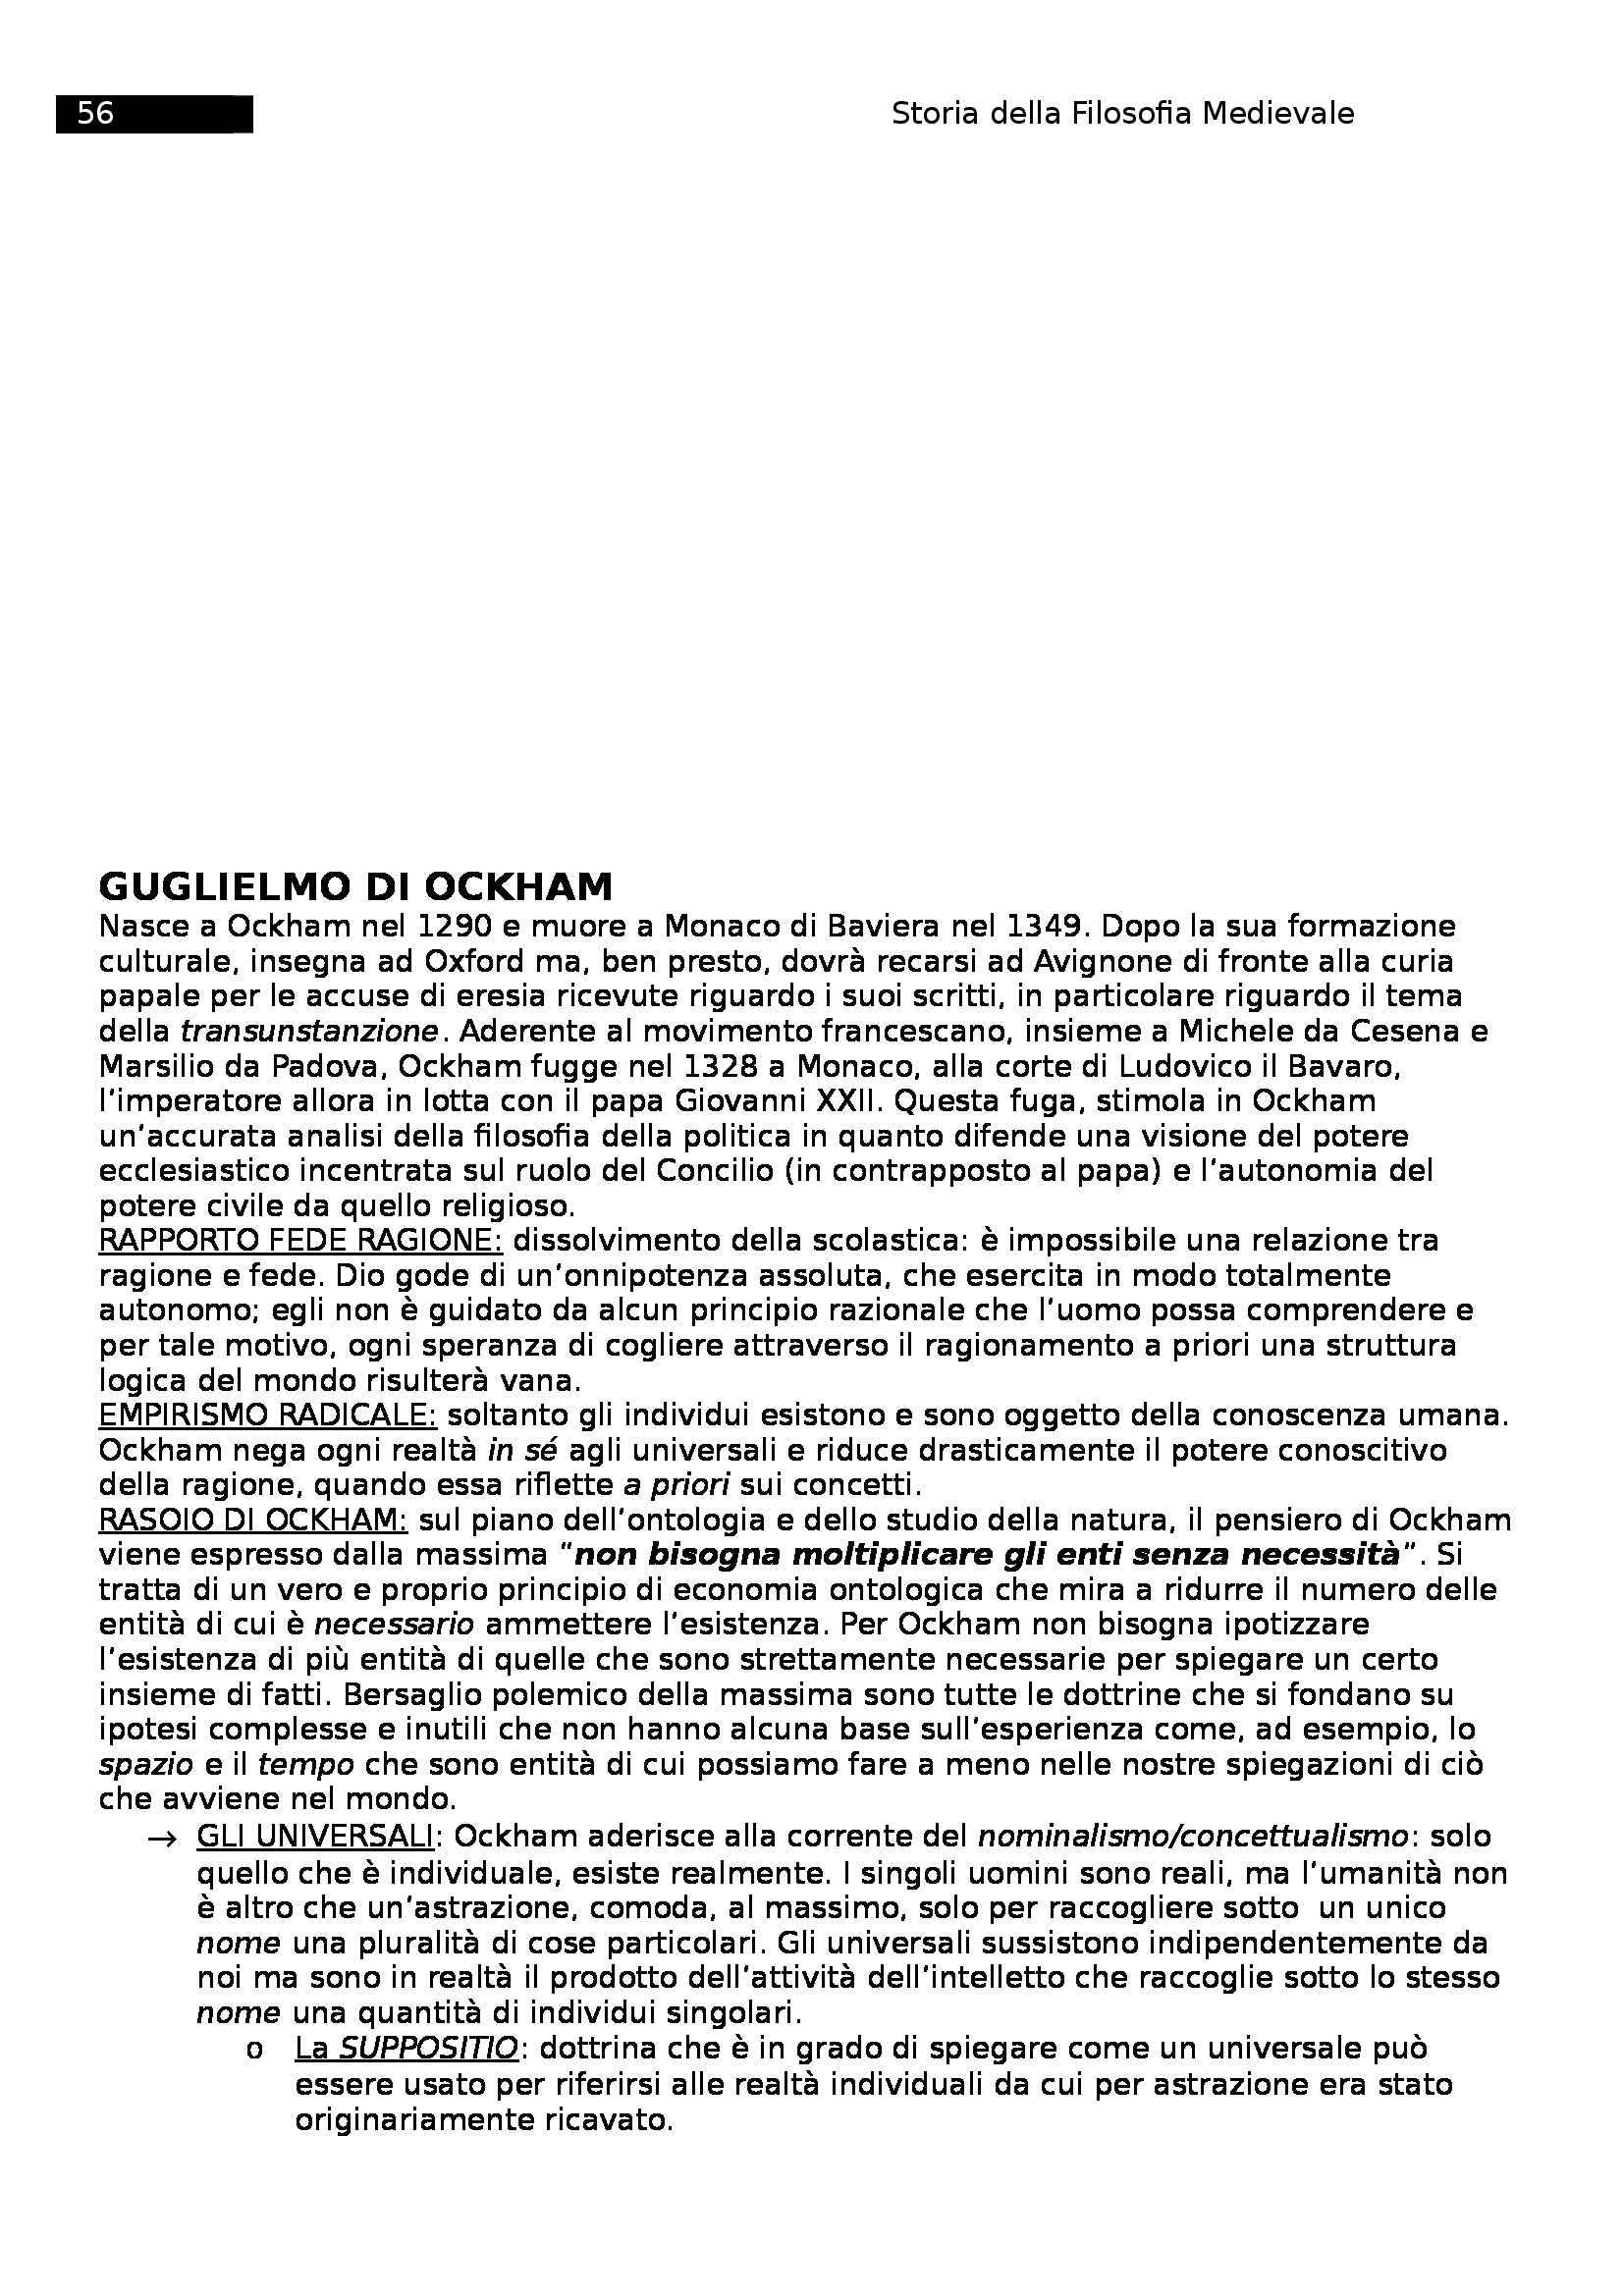 Riassunto esame Storia della filosofia medievale, prof. Sorge Pag. 56